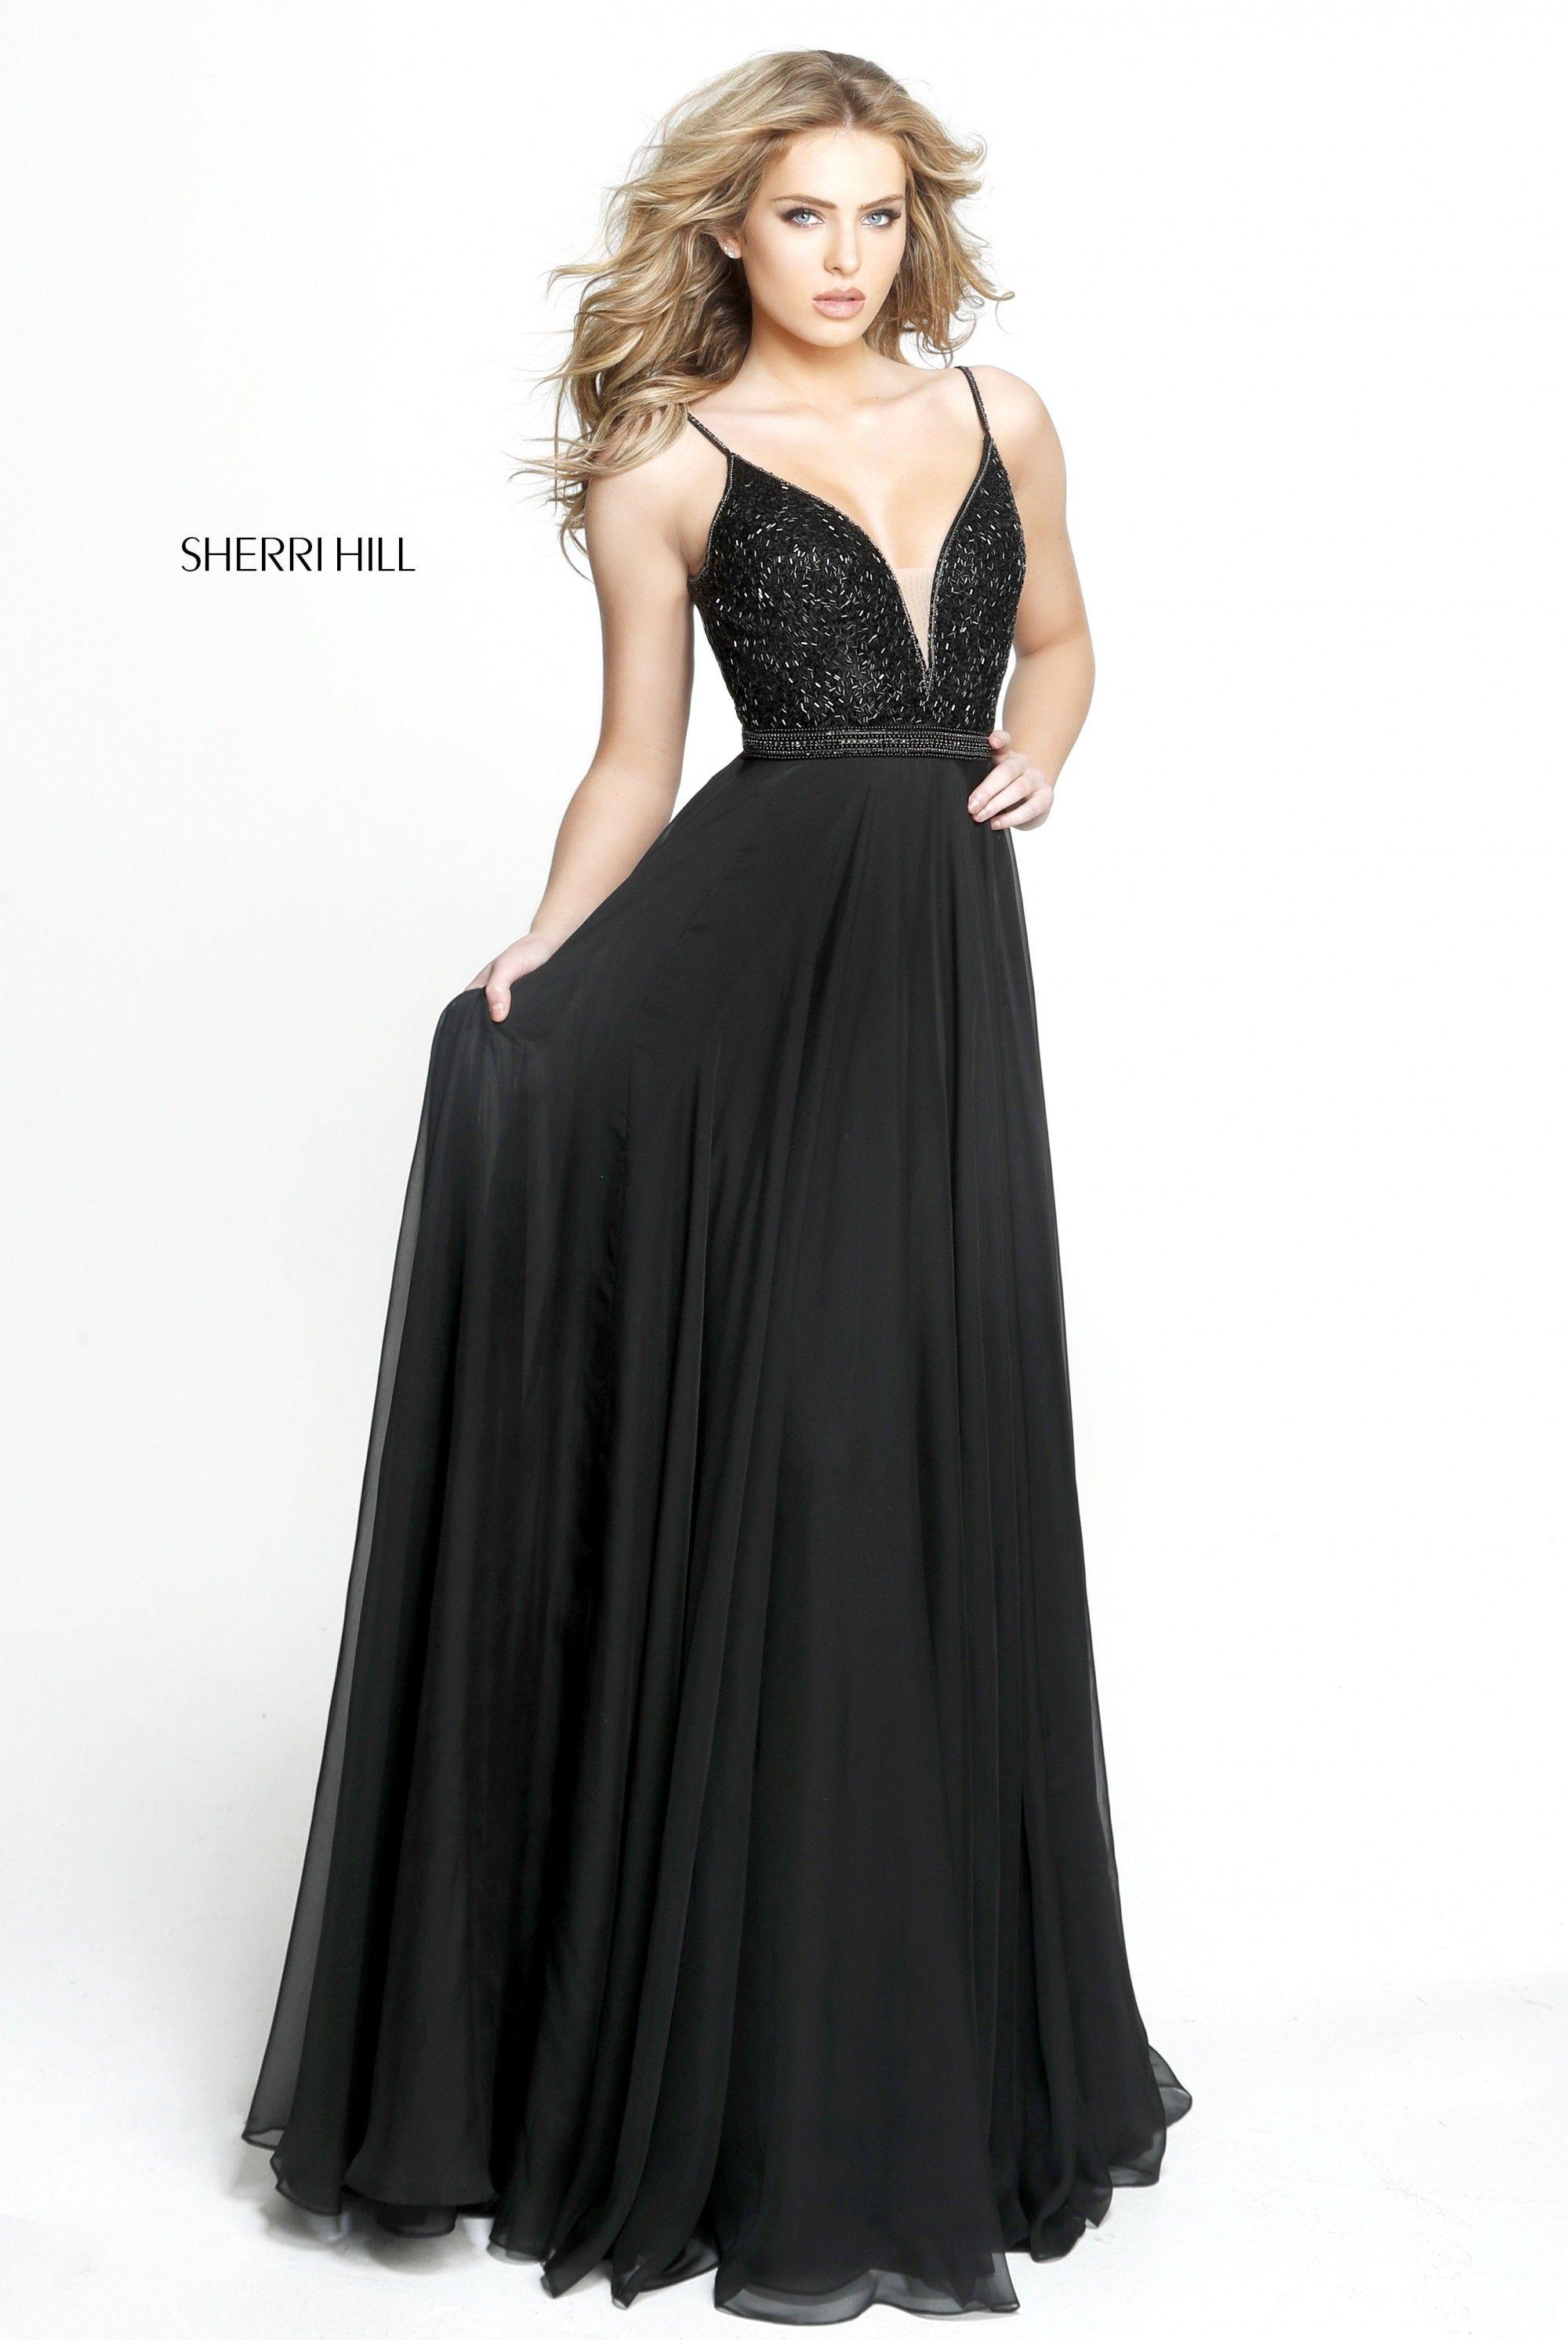 Sherri hill beaded chiffon long dress in senior prom